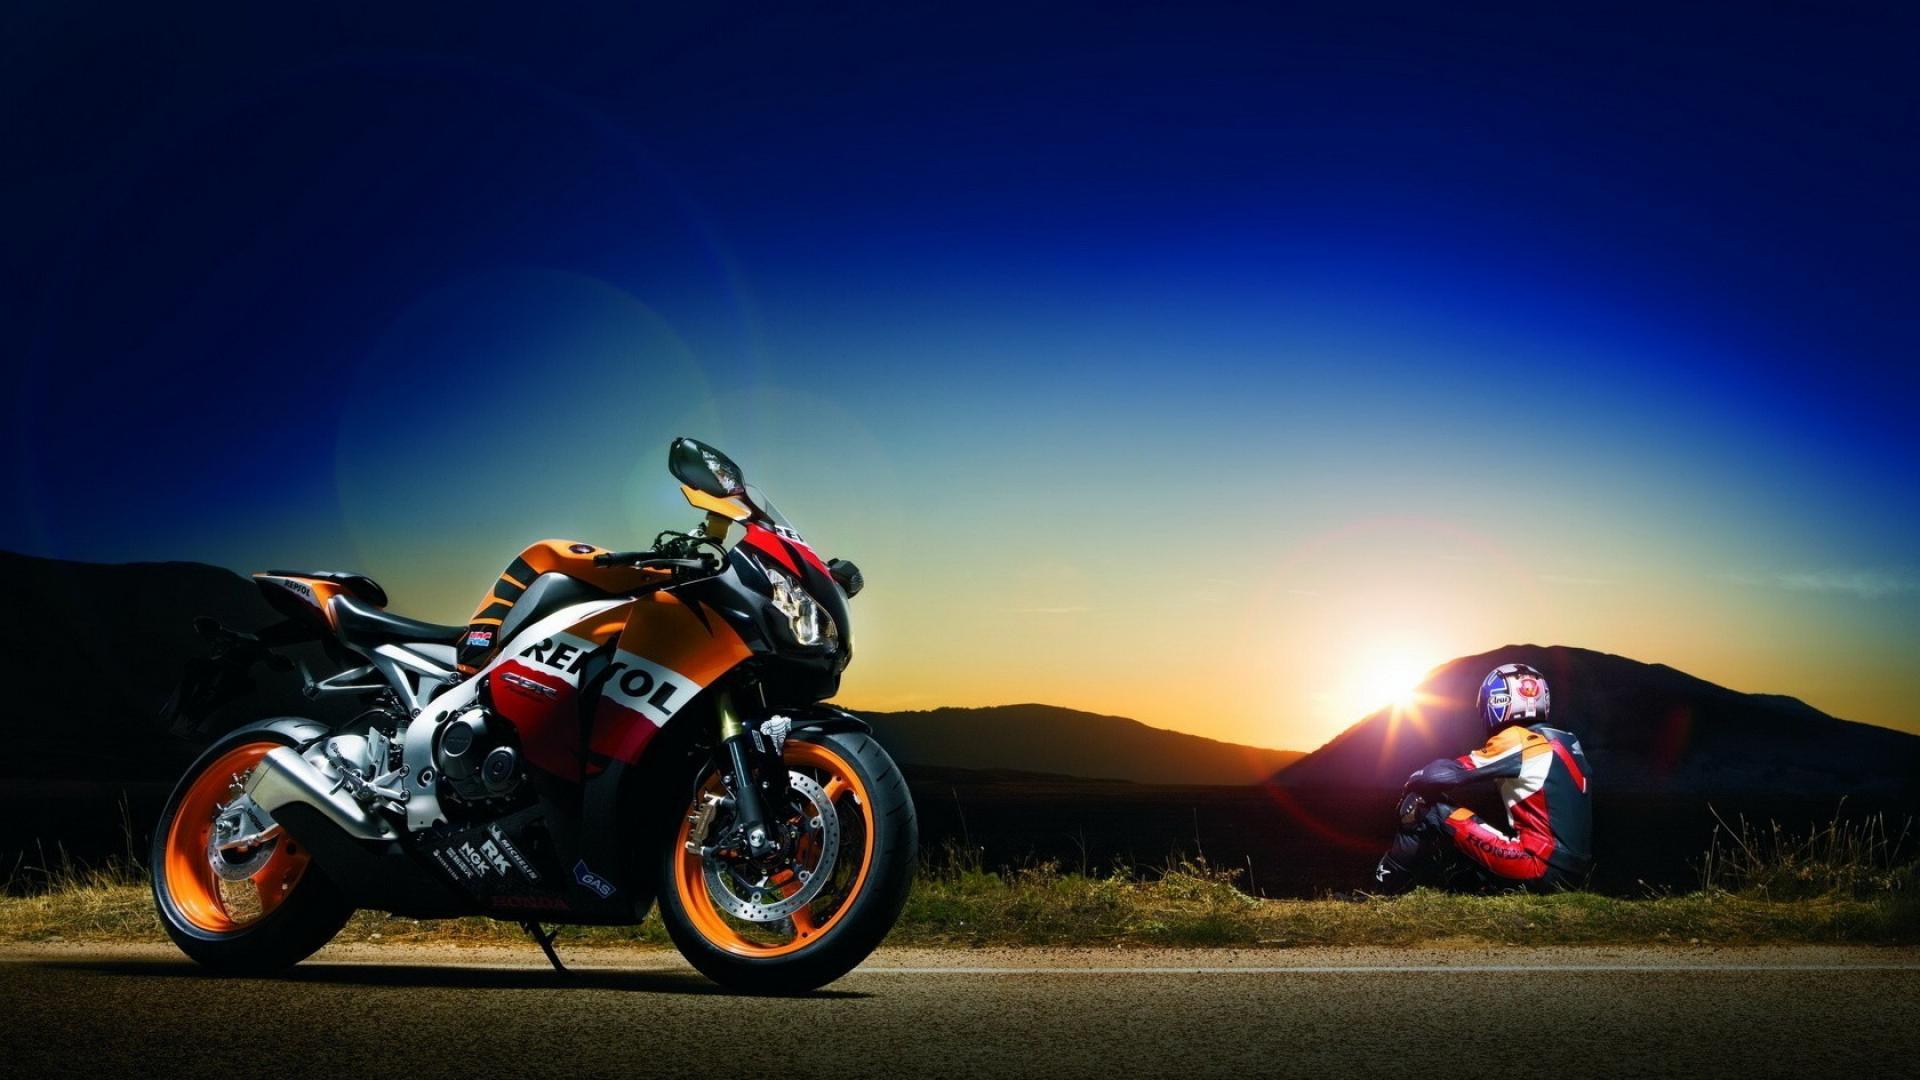 Honda CBR Repsol Wallpapers   Top Honda CBR Repsol 1920x1080